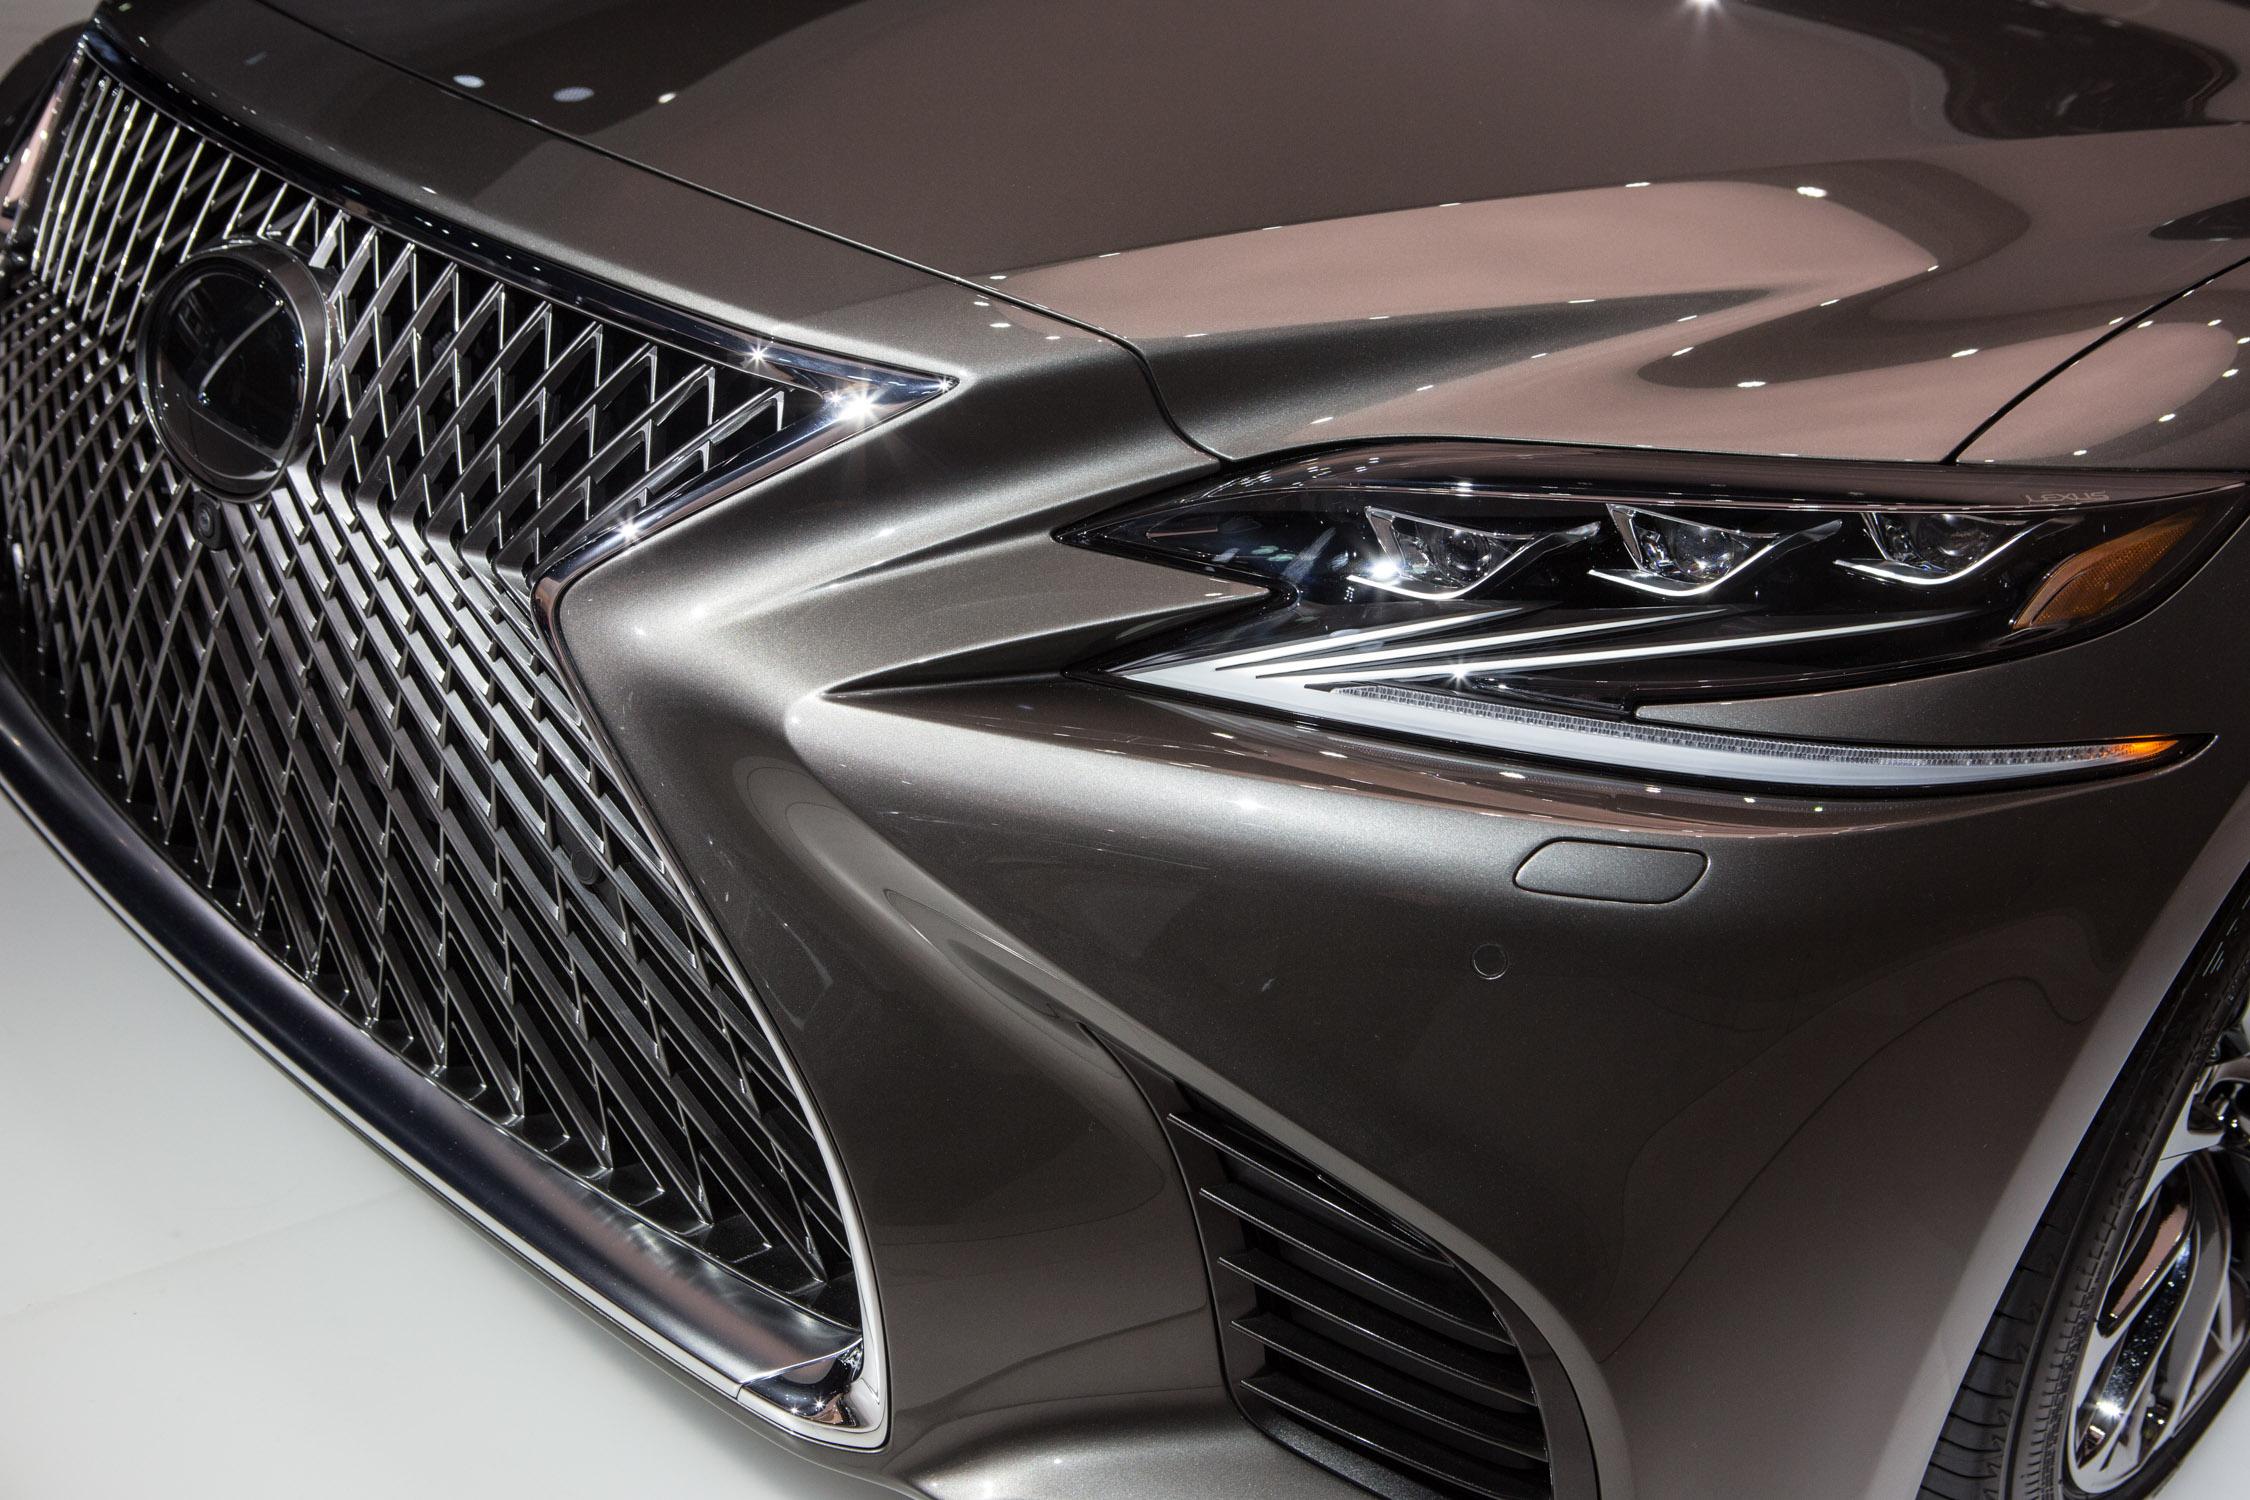 Detroit Auto Show Photo Highlights AutoNXT - Year one car show 2018